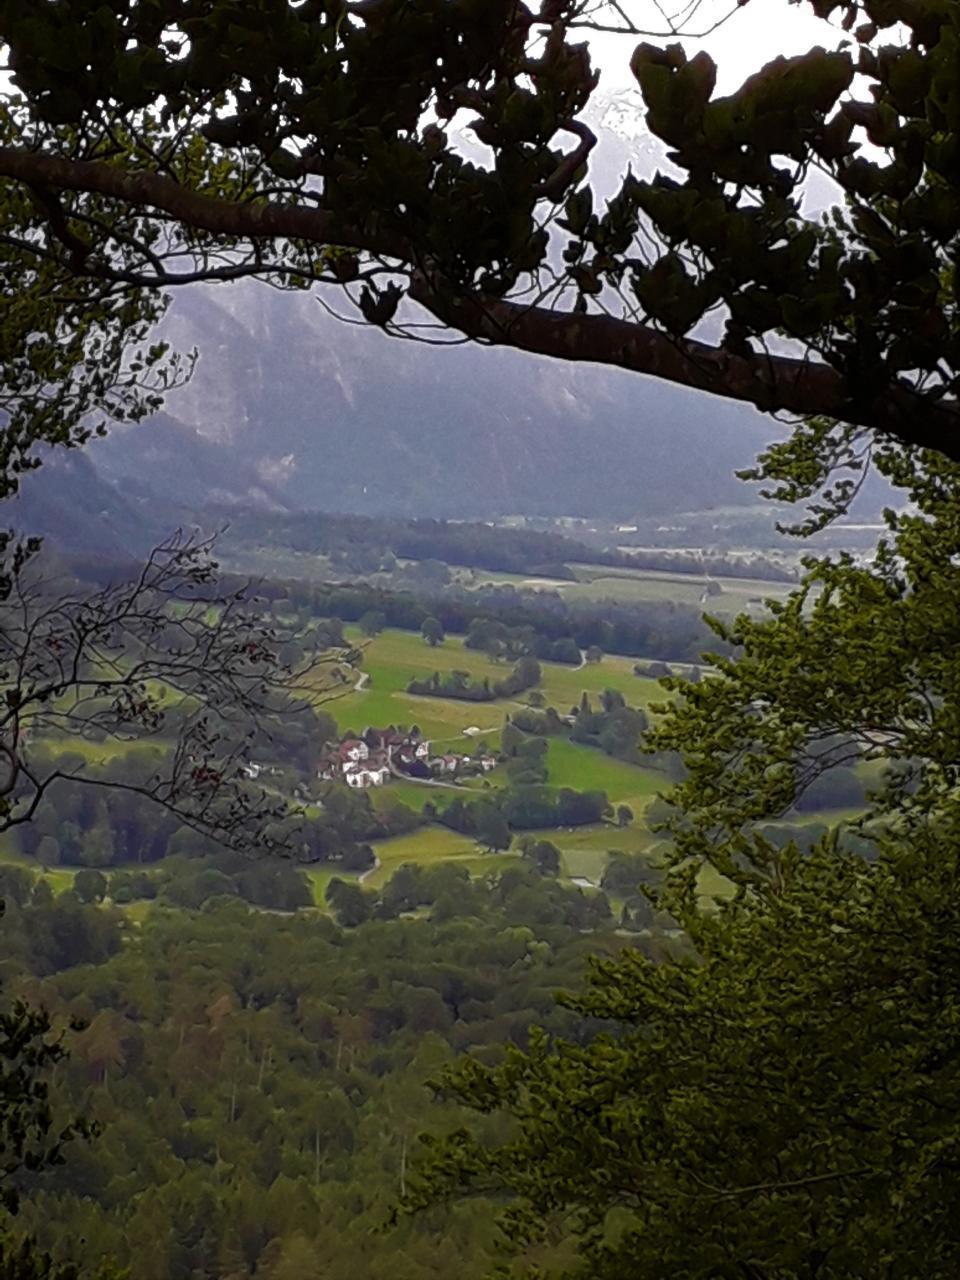 Maison de vacances Heidihuus - Ferienhaus*** im sonnigen Heidiland (817543), Maienfeld, Pays d'Heidi, Suisse Orientale, Suisse, image 19